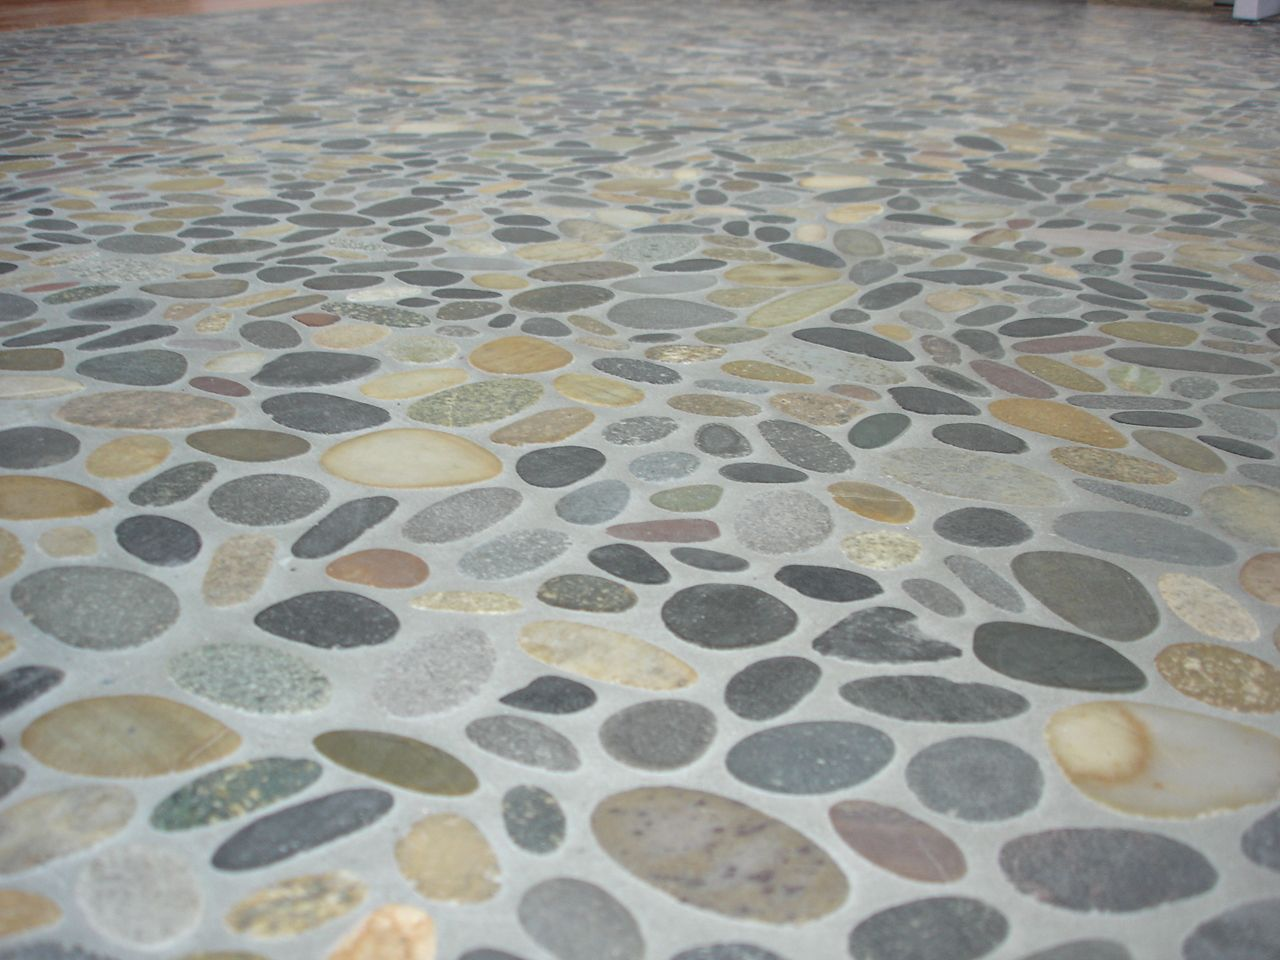 Captivating River Rock Tile Flooring U2013 | Home Interior Design IdeasHome .